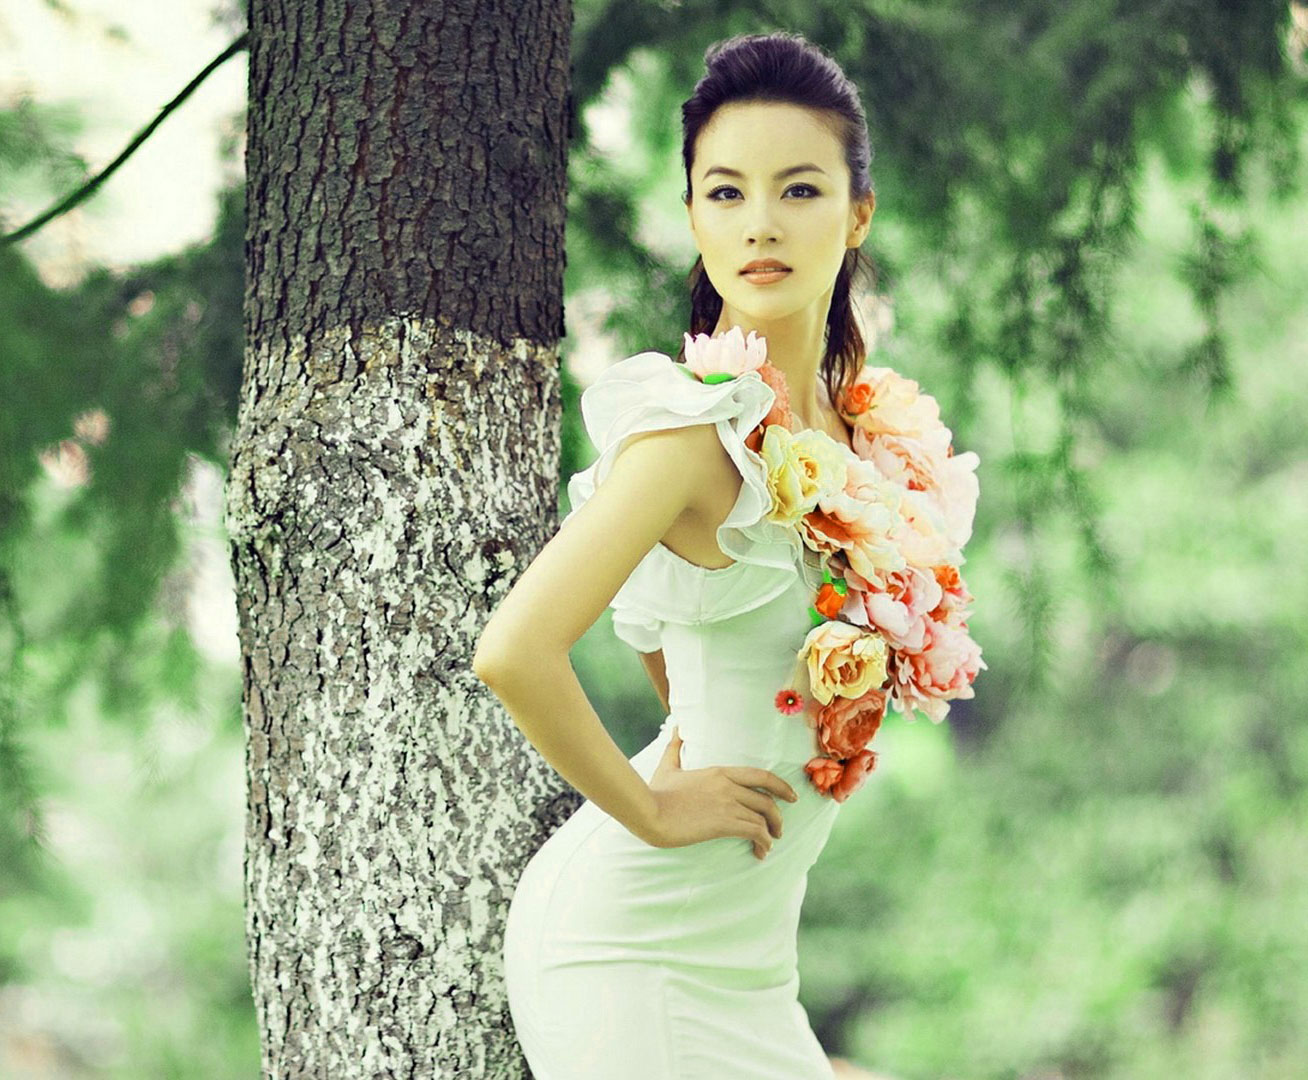 Girls sweet whatapp dp Images